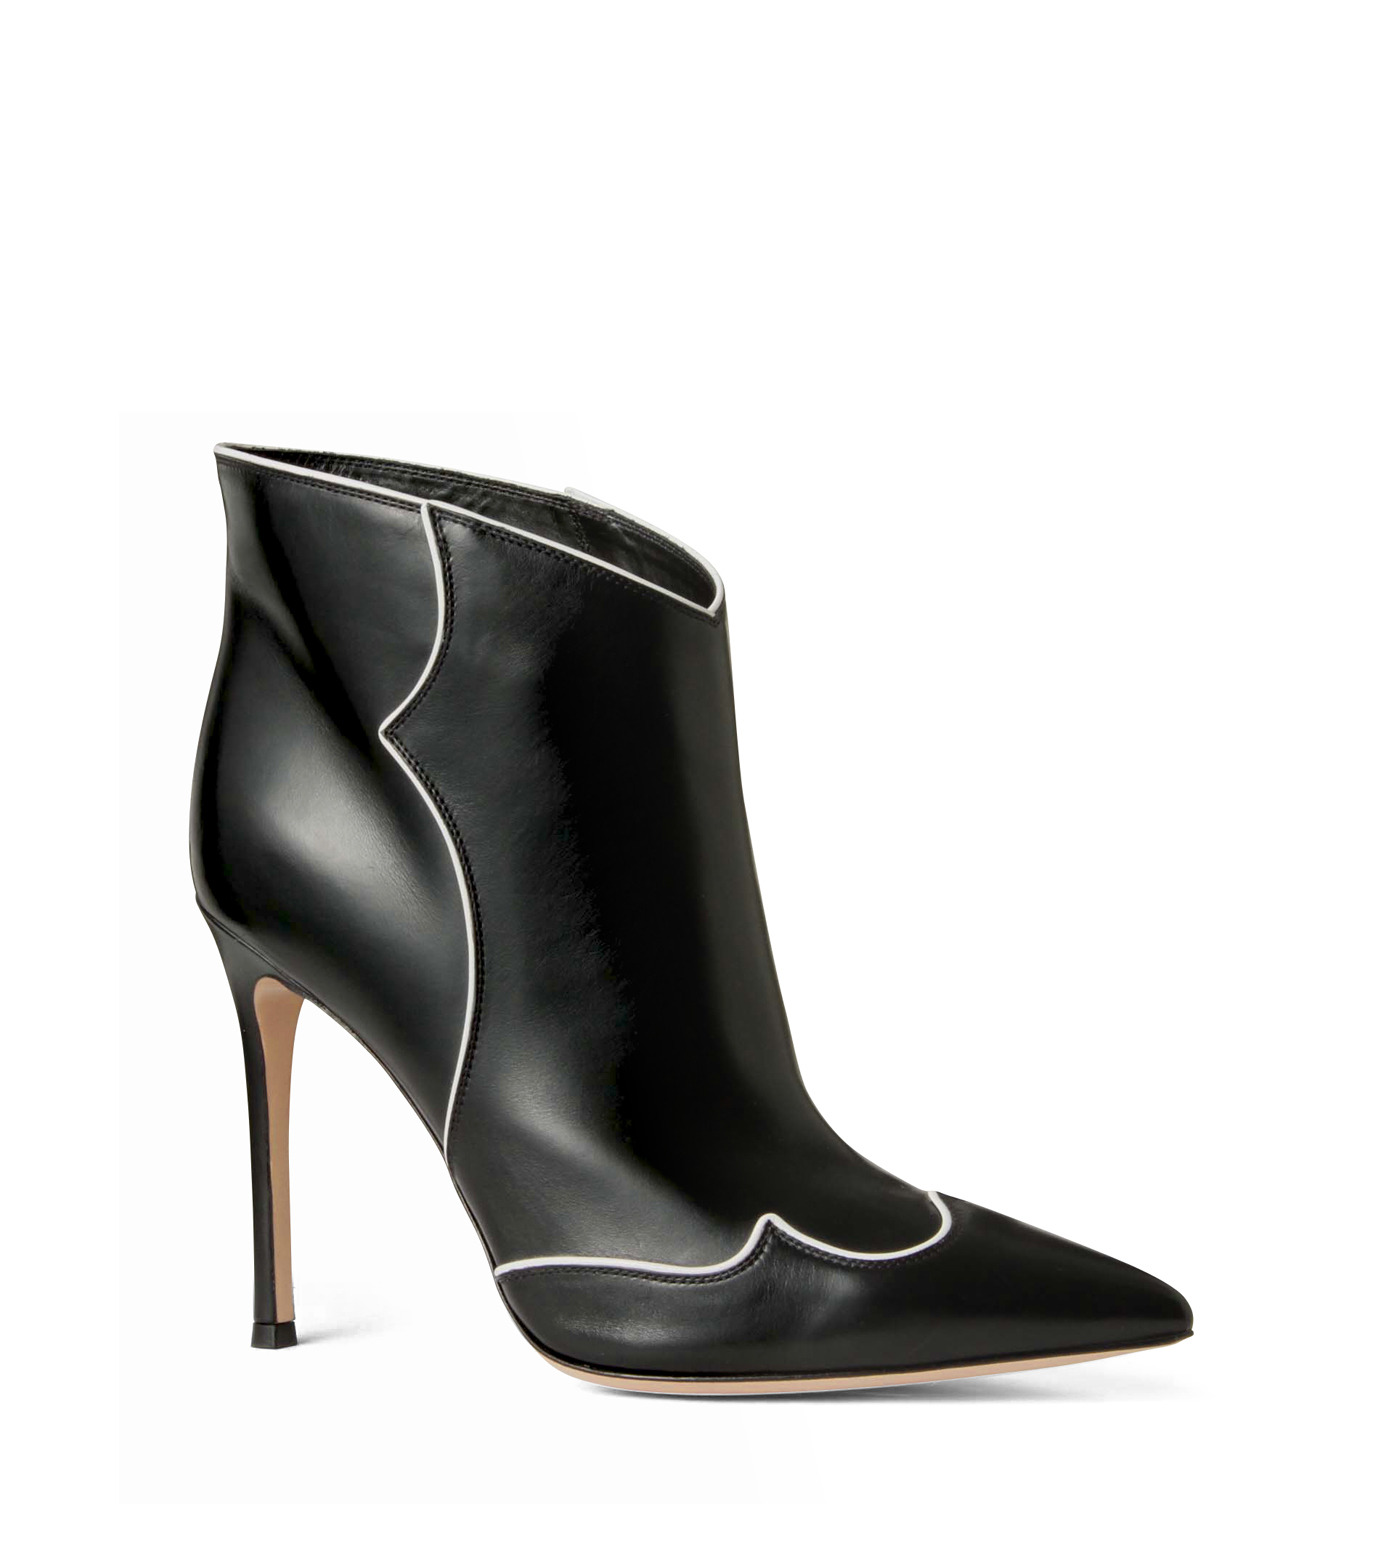 Gianvito Rossi(ジャンヴィト ロッシ)のWestern Stitch Bootie-BLACK(シューズ/shoes)-GQ05936-13 拡大詳細画像1